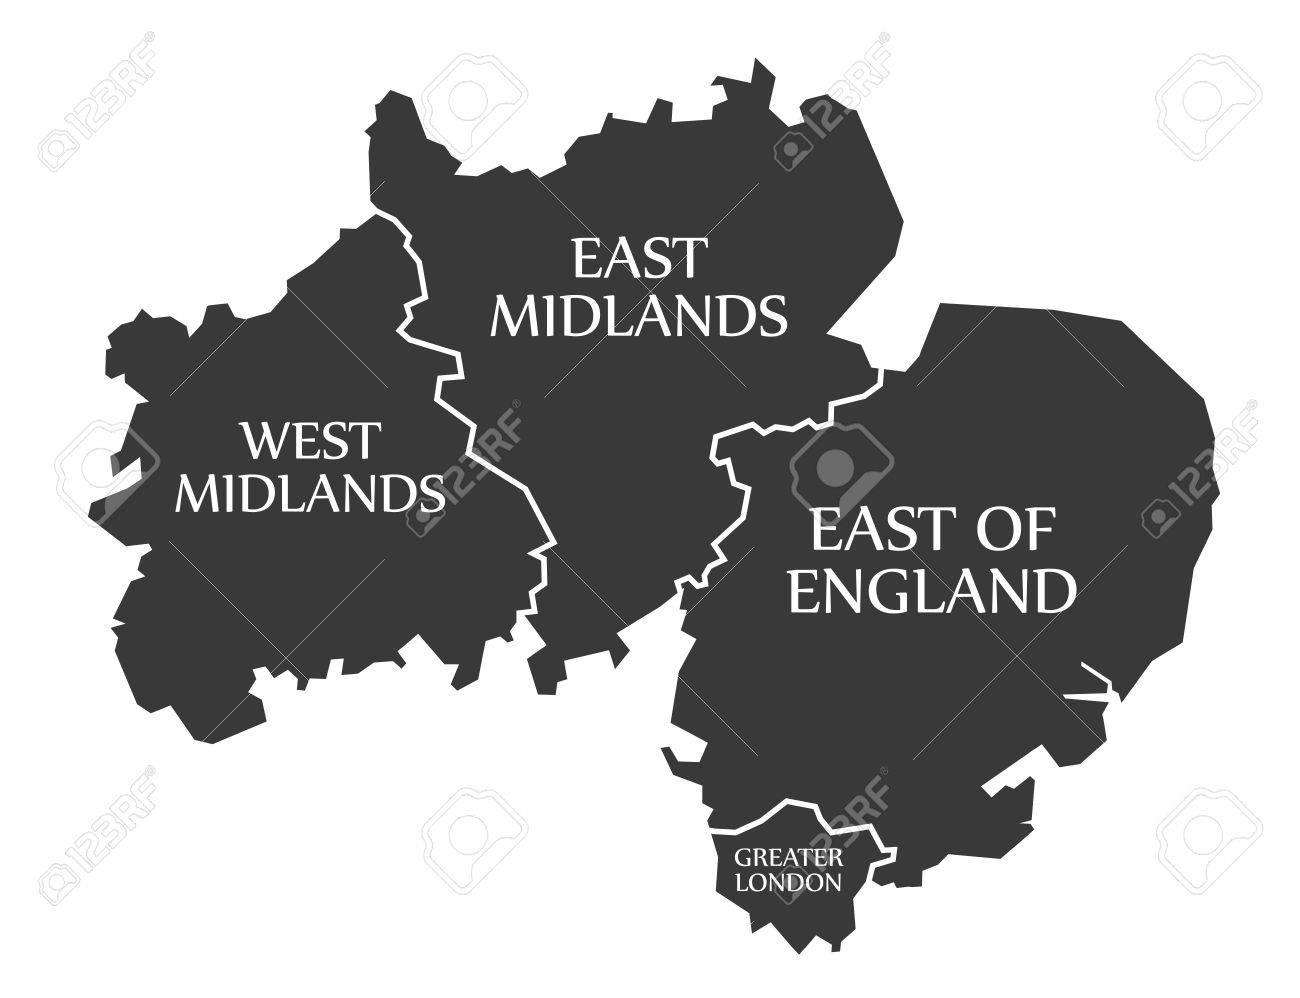 West Midlands East Midlands East Of England Greater London